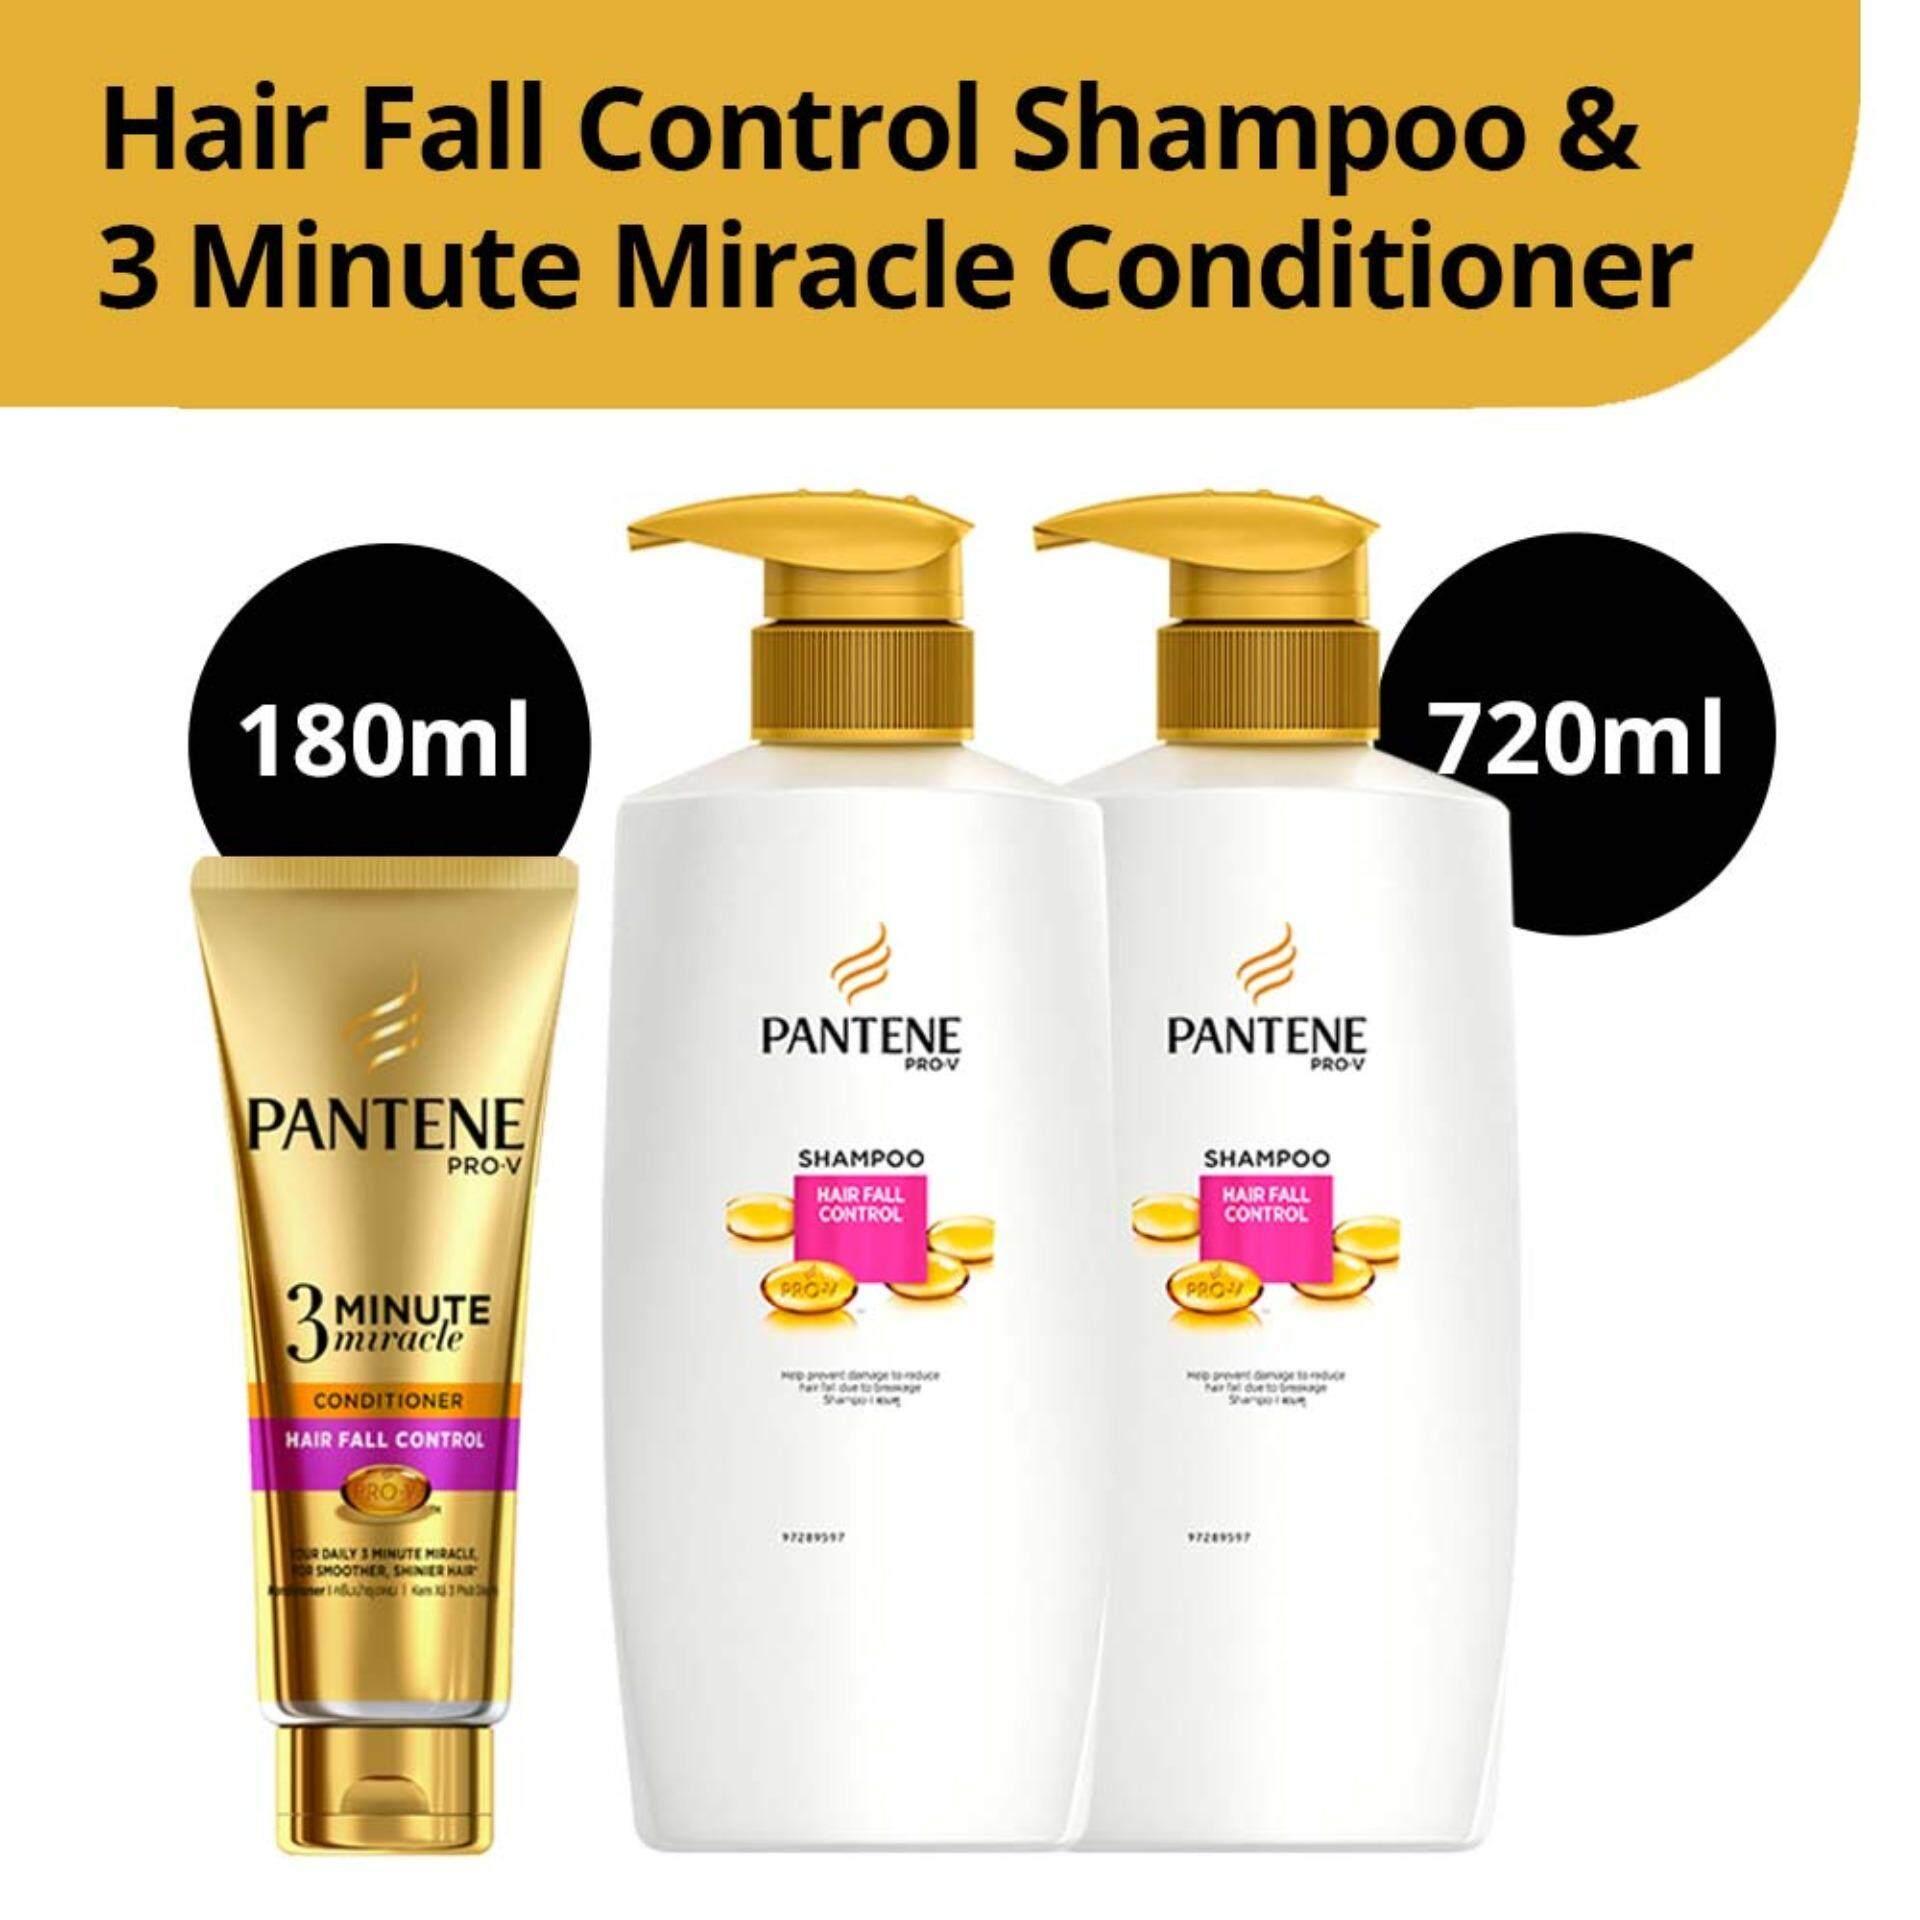 Pantene Pro-V Hair Fall Control Shampoo x 2 + 3 Minute Conditioner Bundle